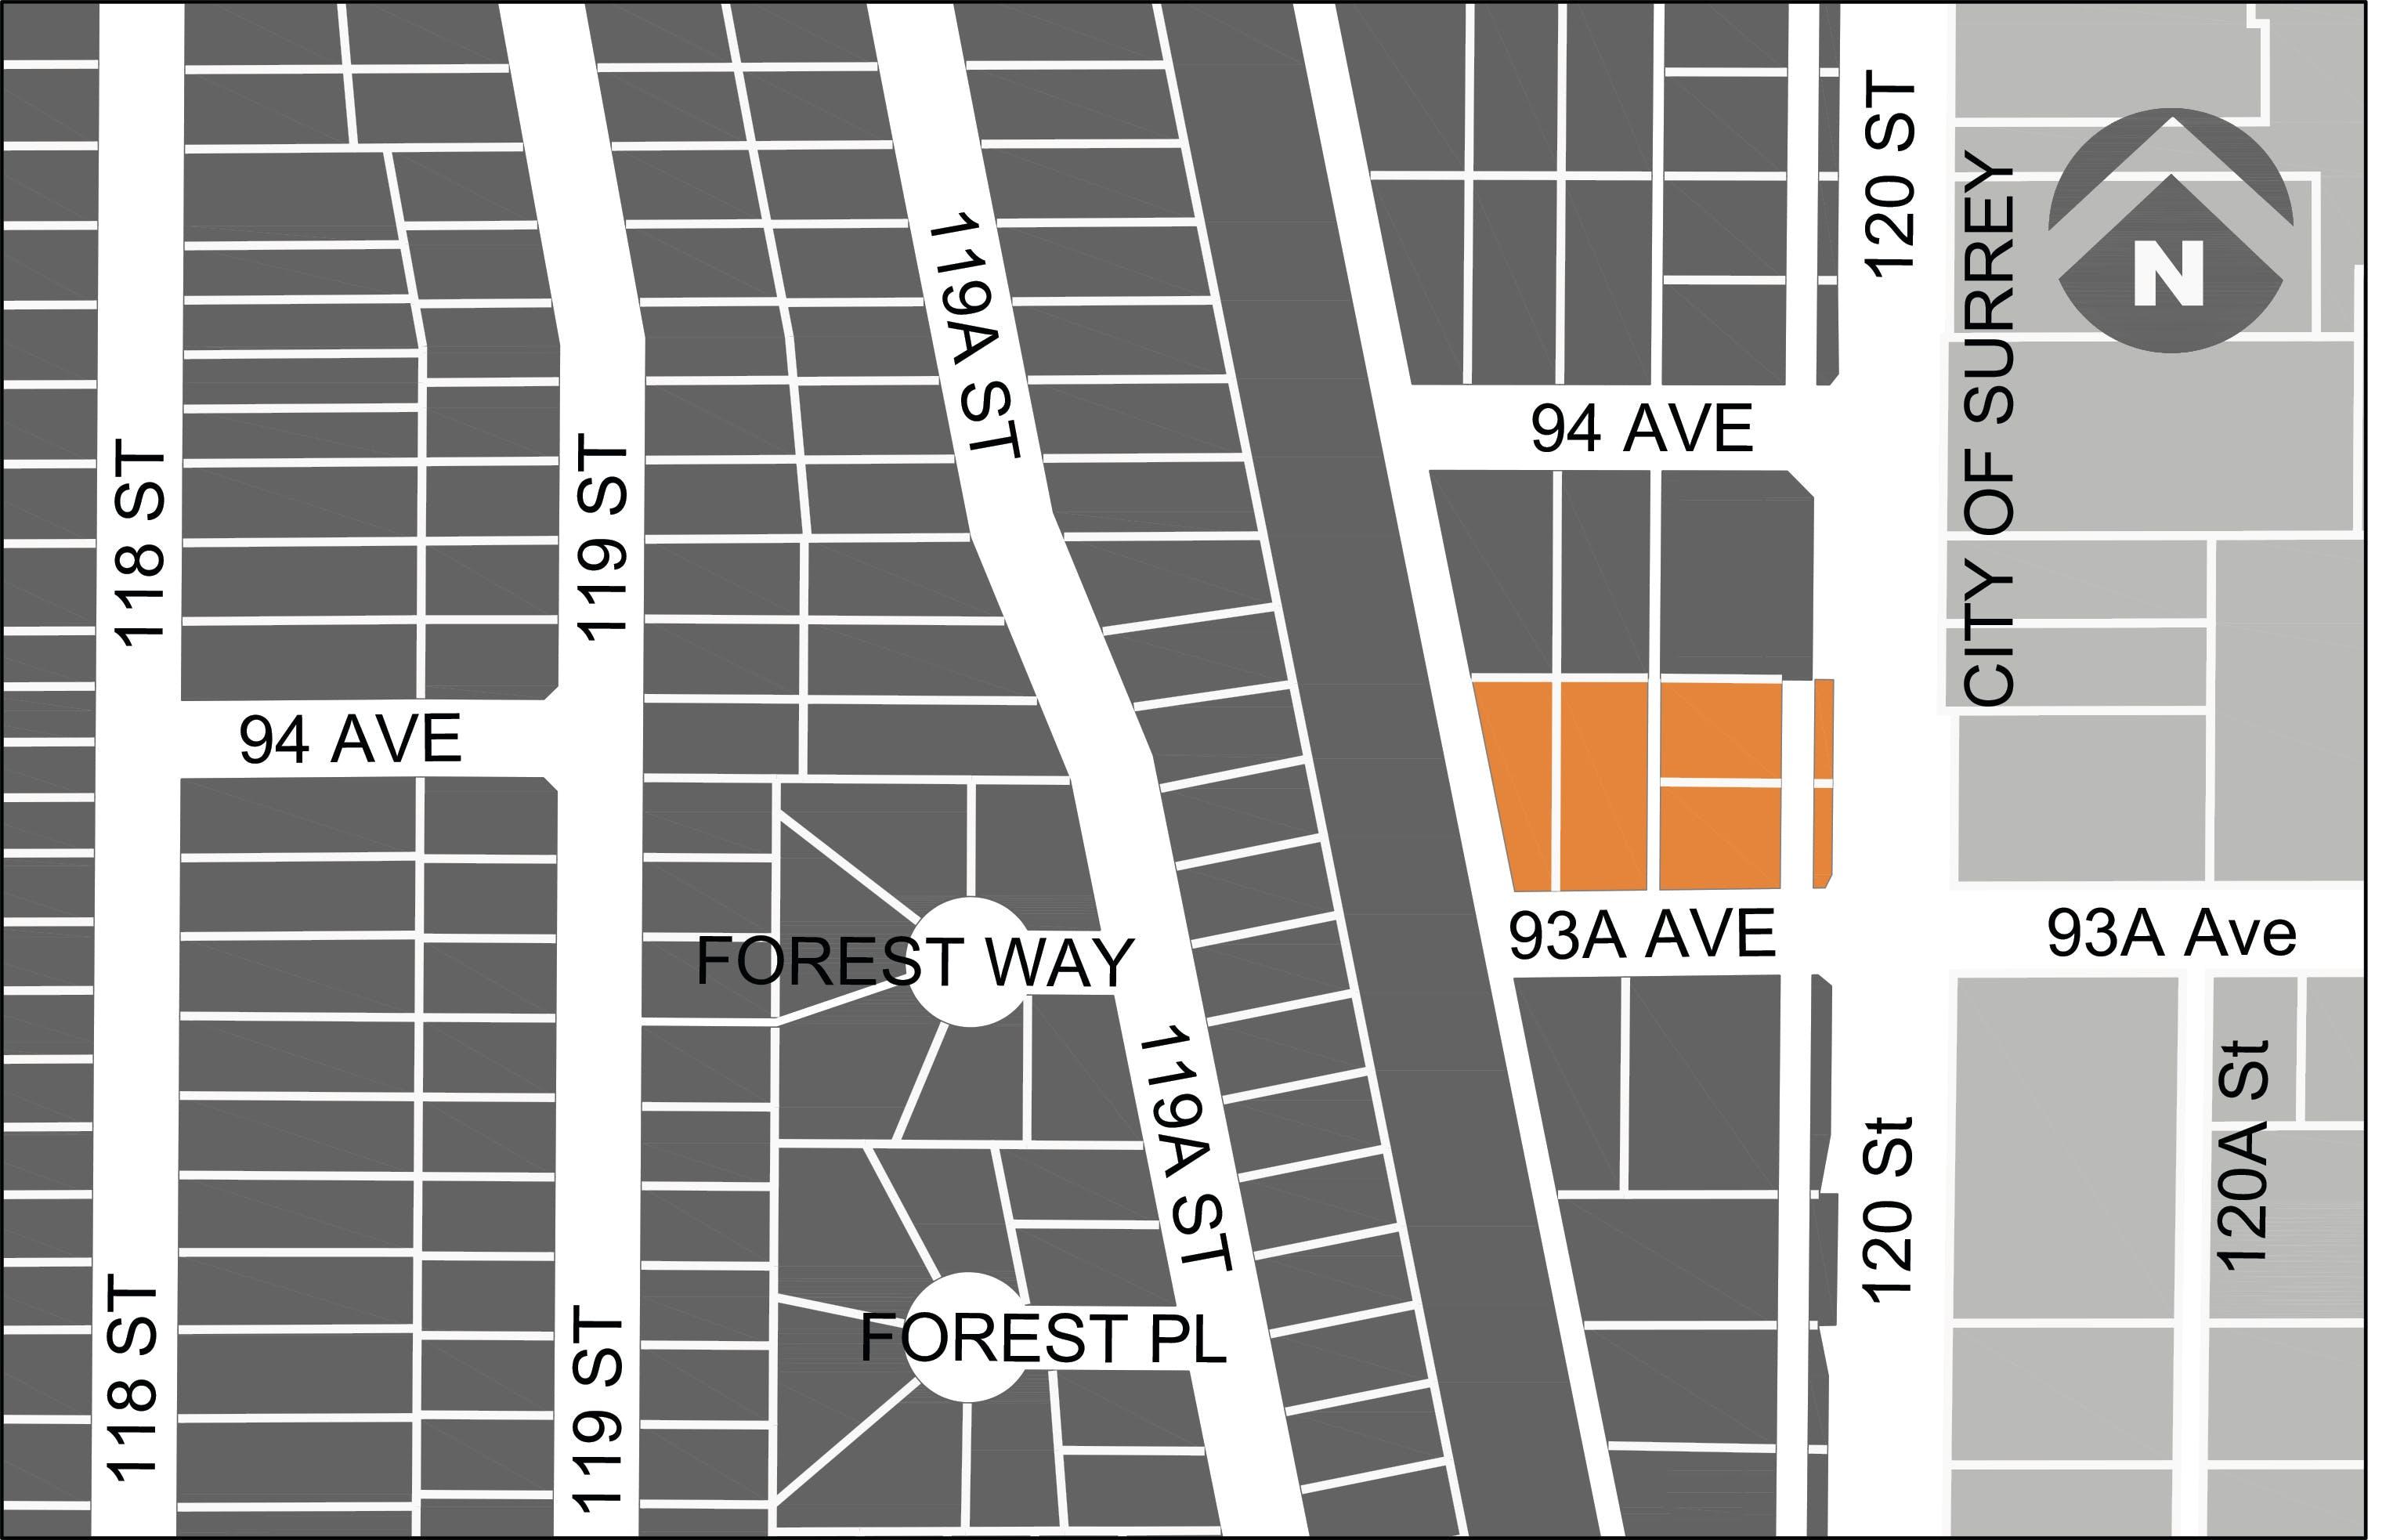 LU009043_Development App Sign Map.jpg